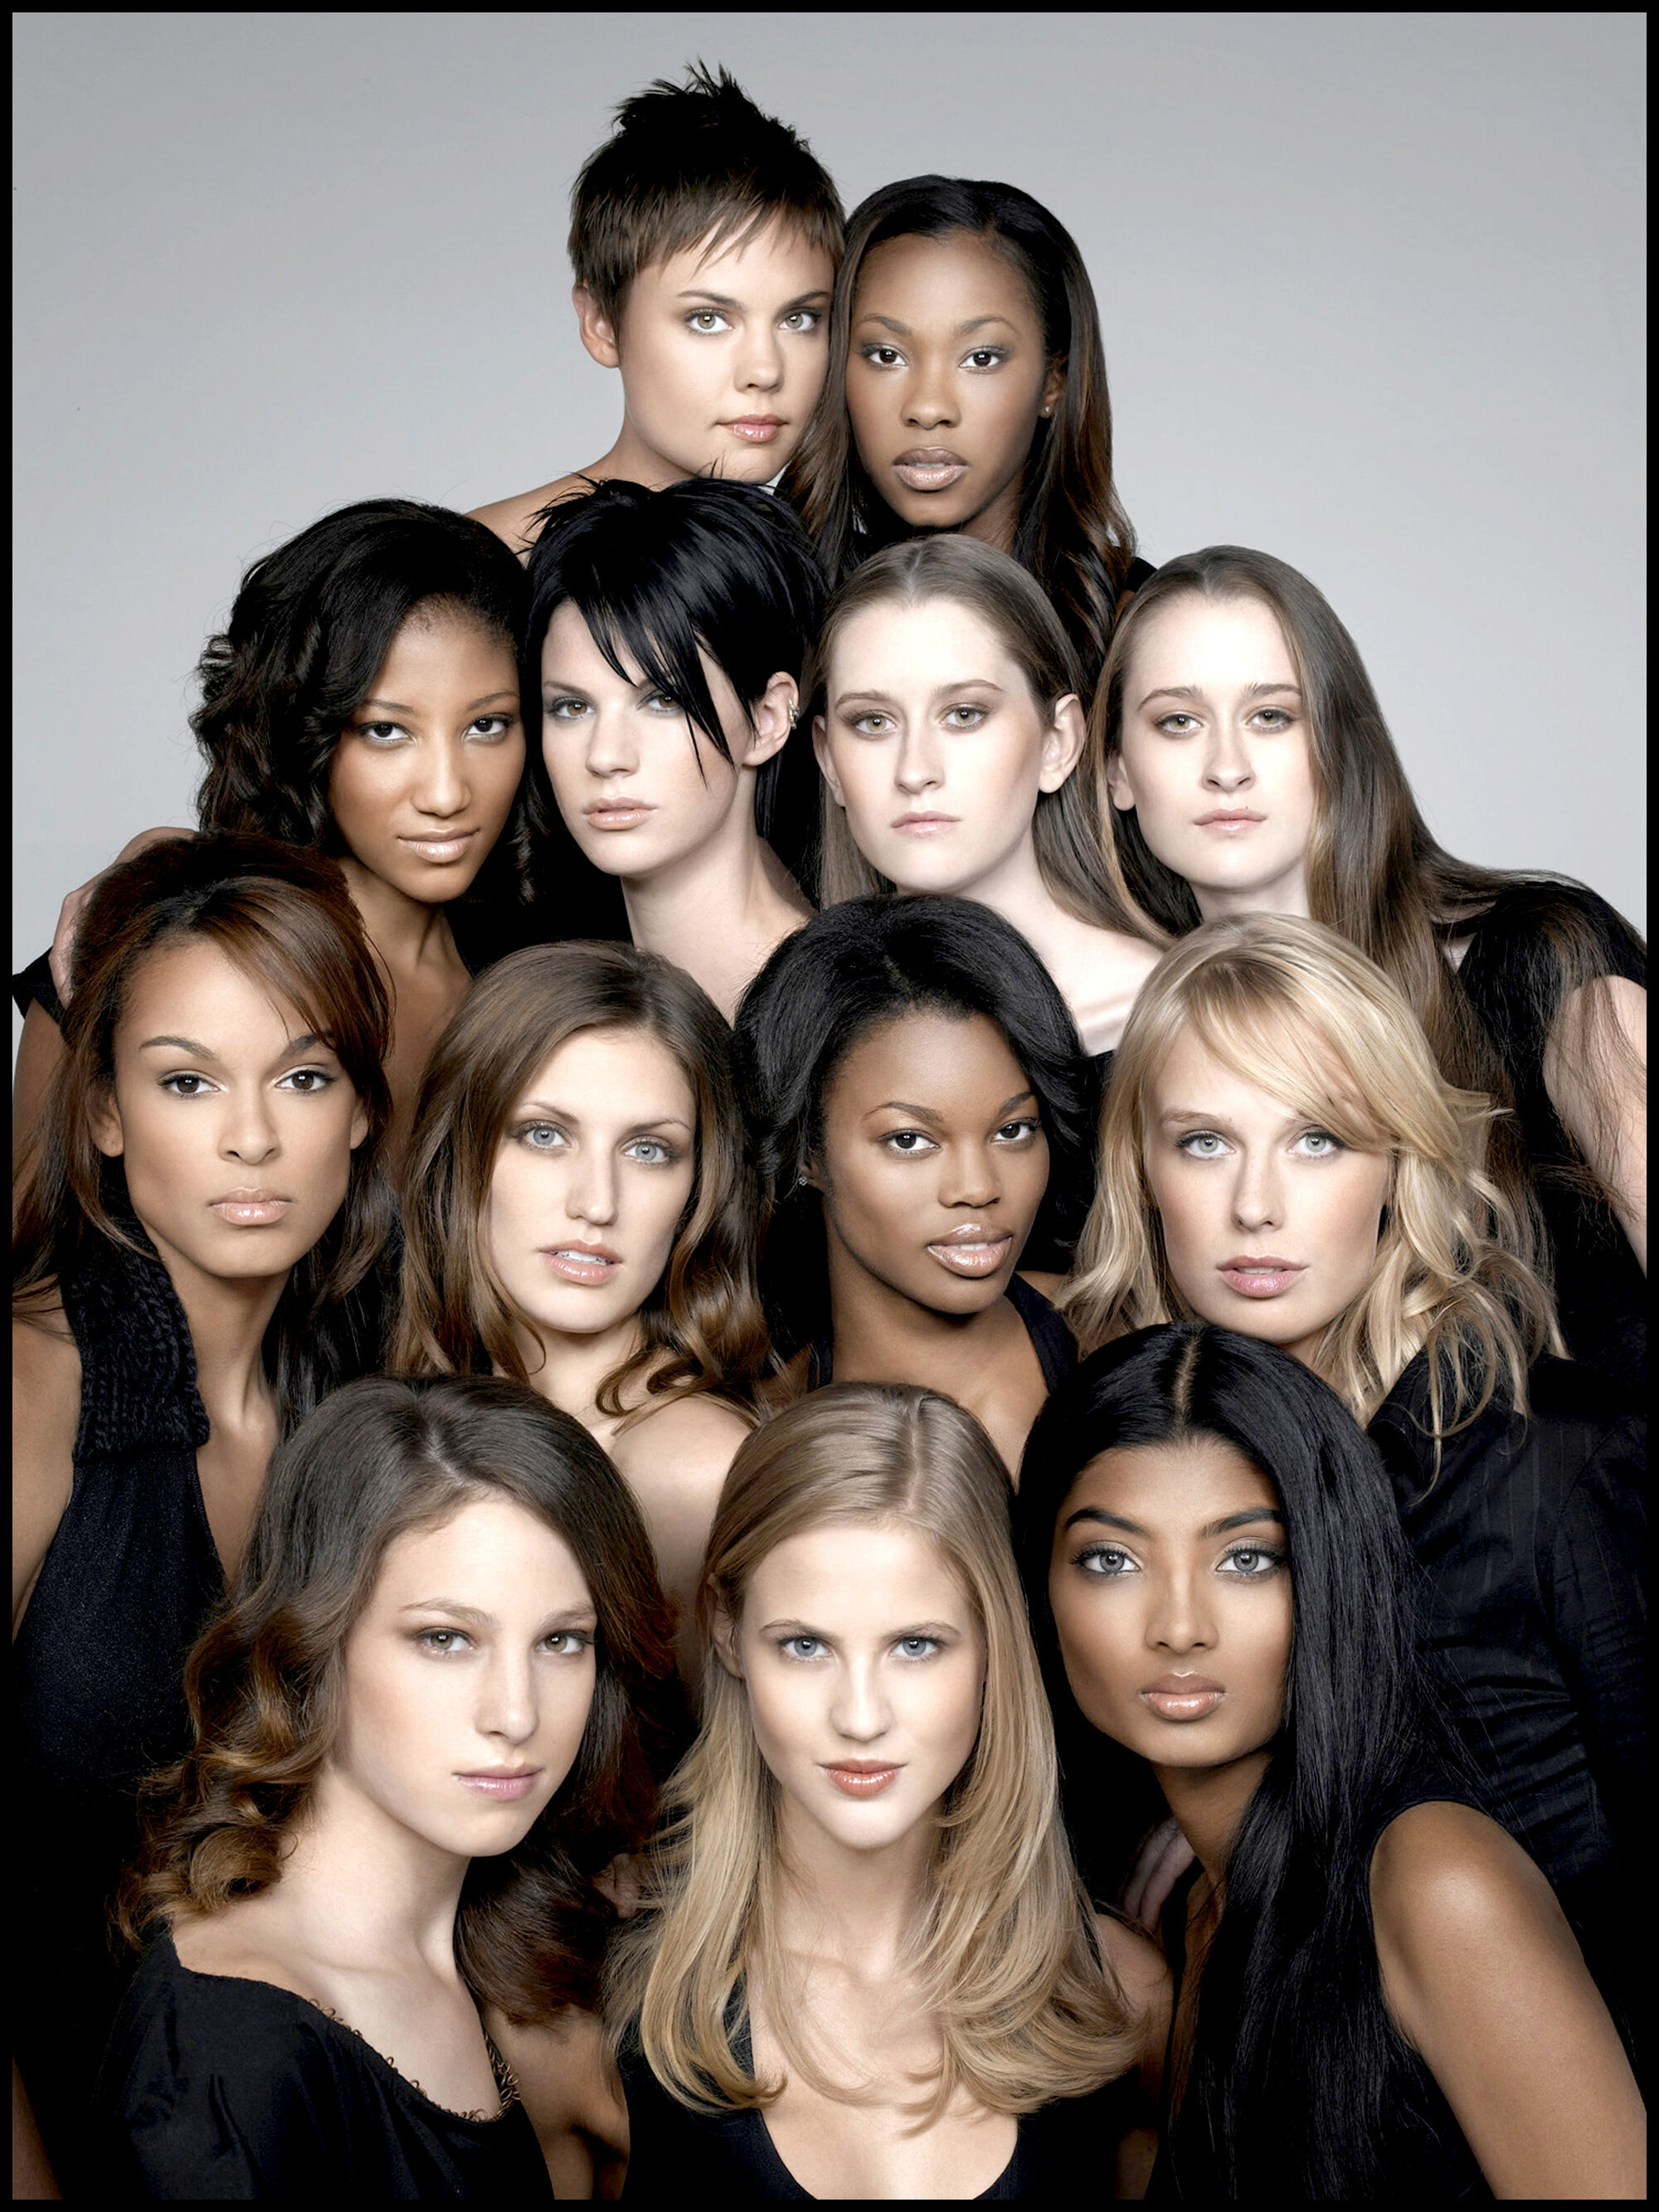 americas next top model season 19 episode 7